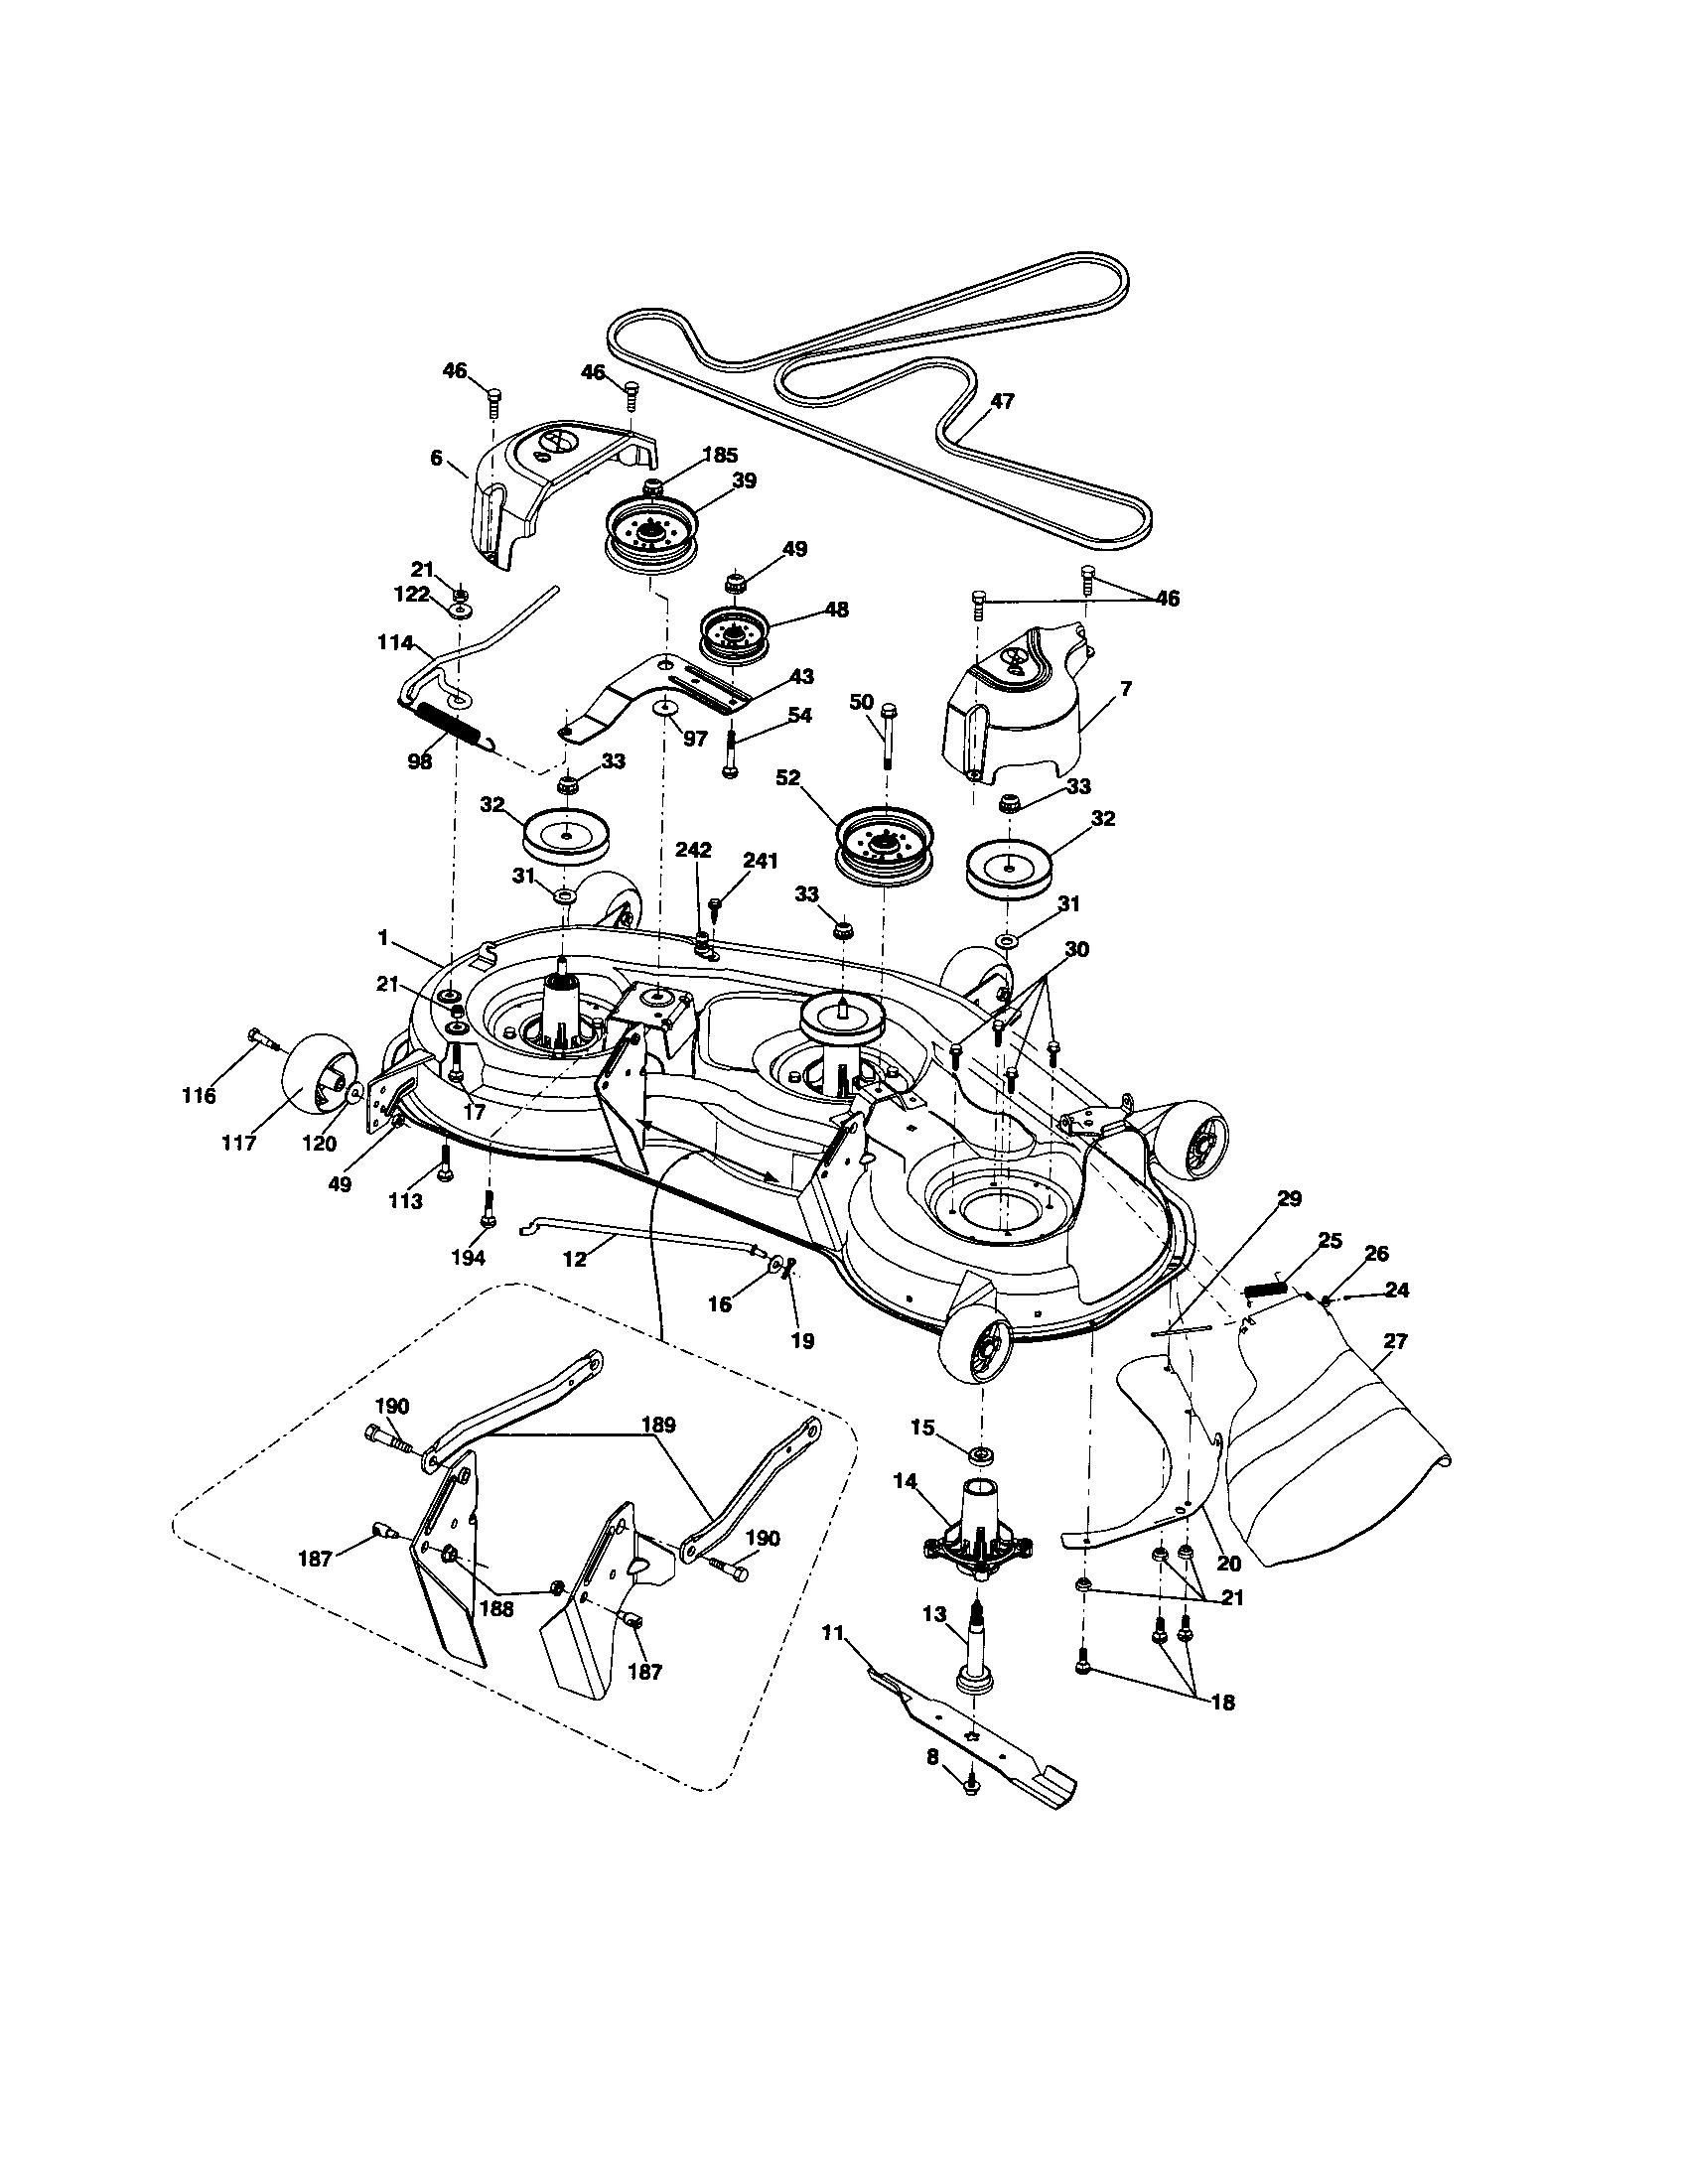 hight resolution of husqvarna yth2348 917289570 mower deck diagram